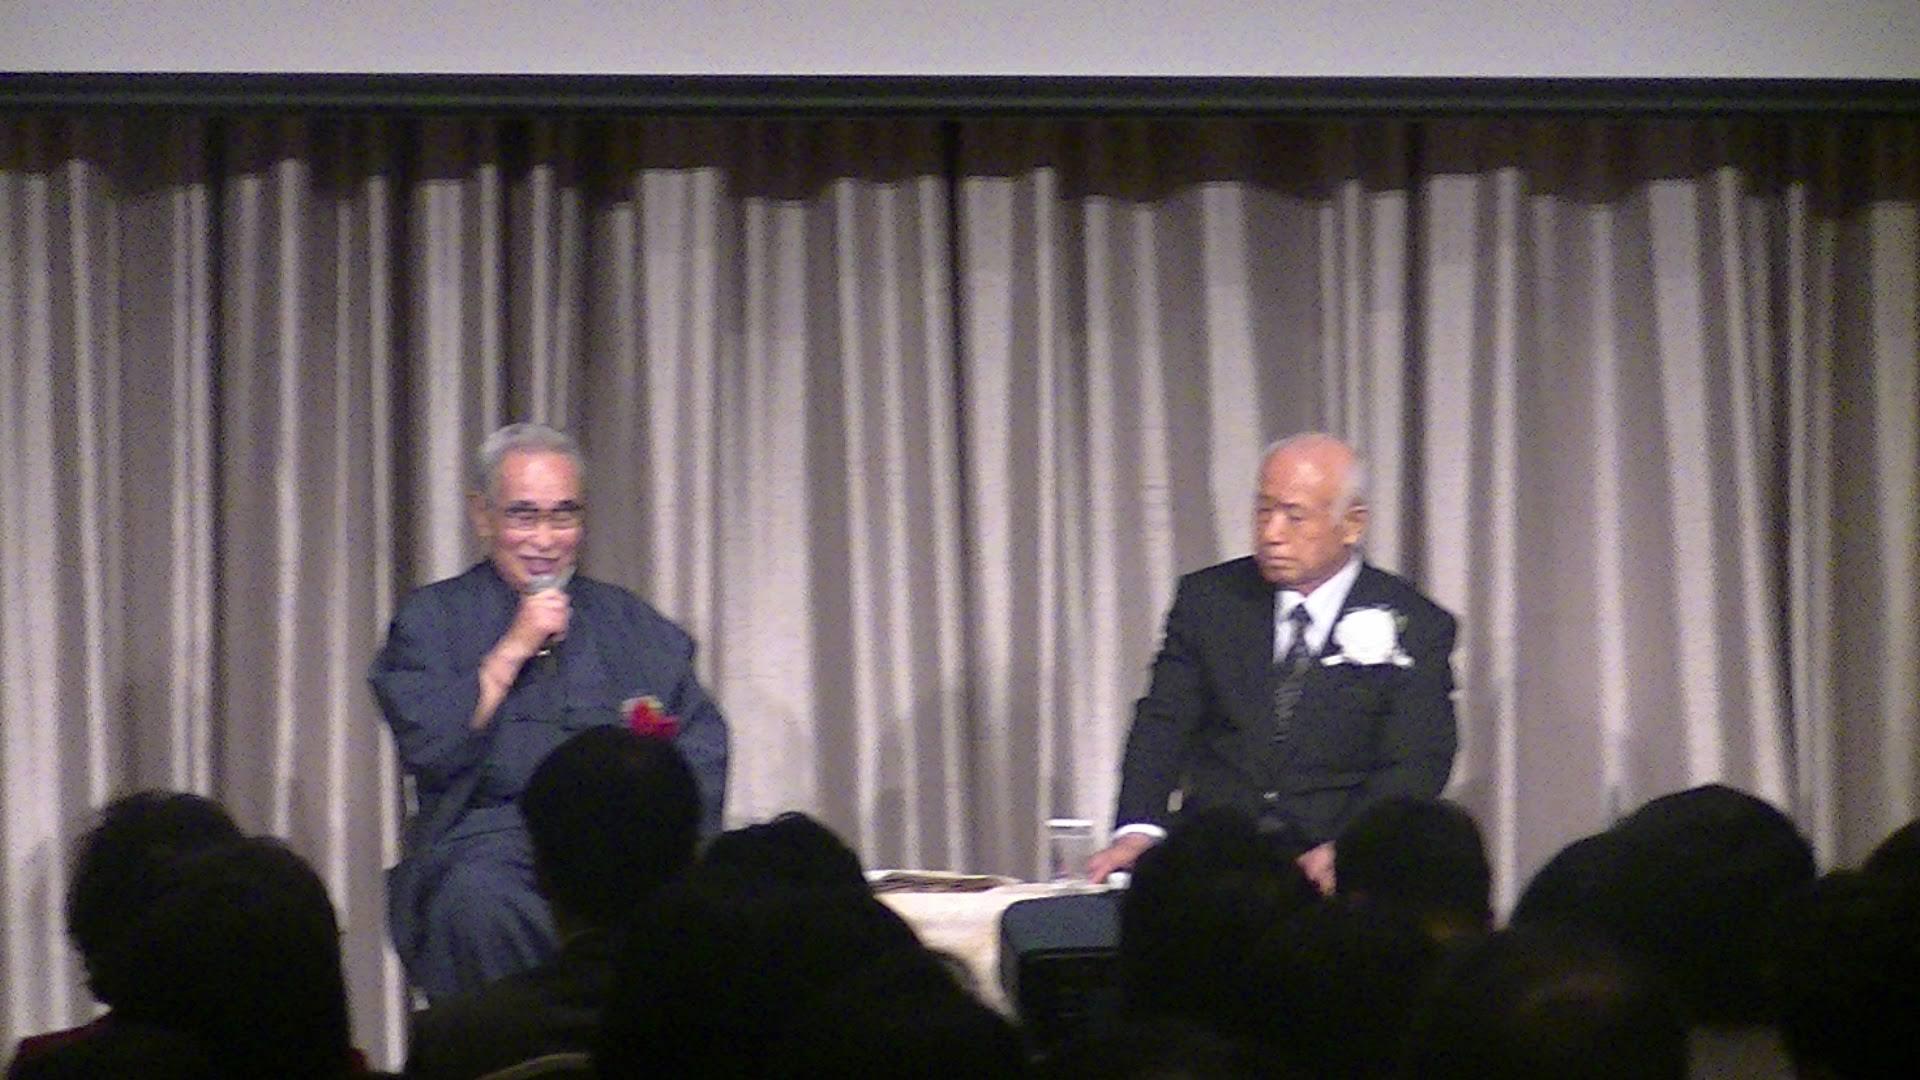 PIC 1792 1 - 思風会全国大会in広島